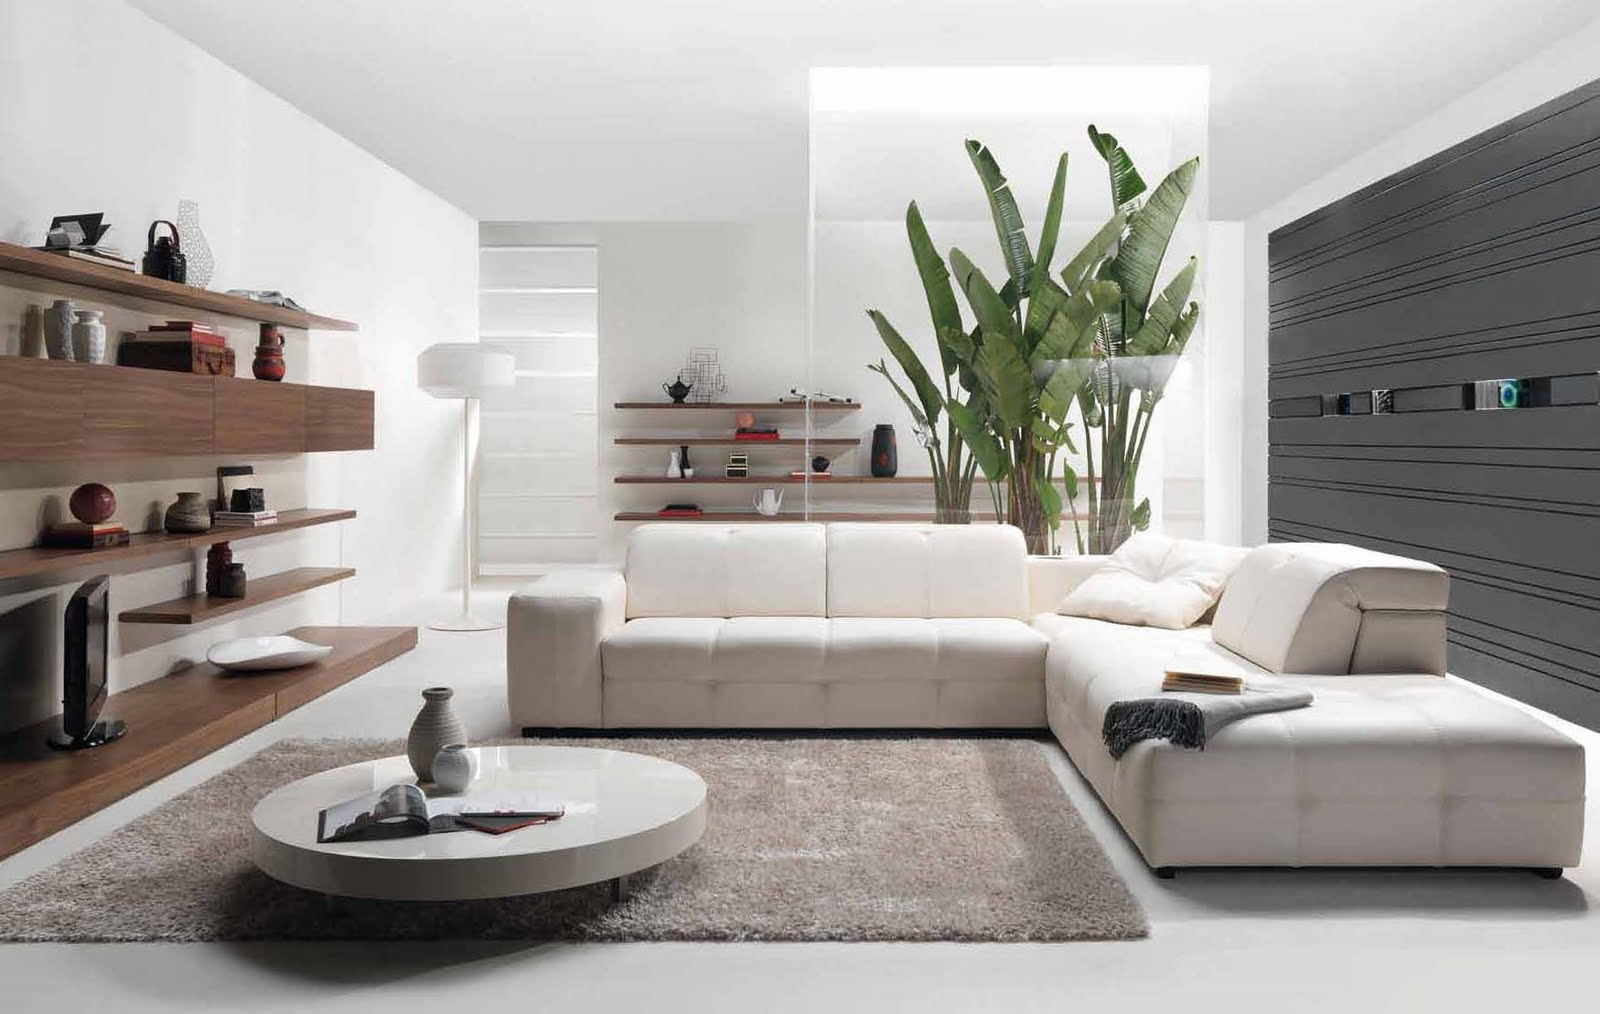 Future House Design: Modern Living Room Interior Design ...